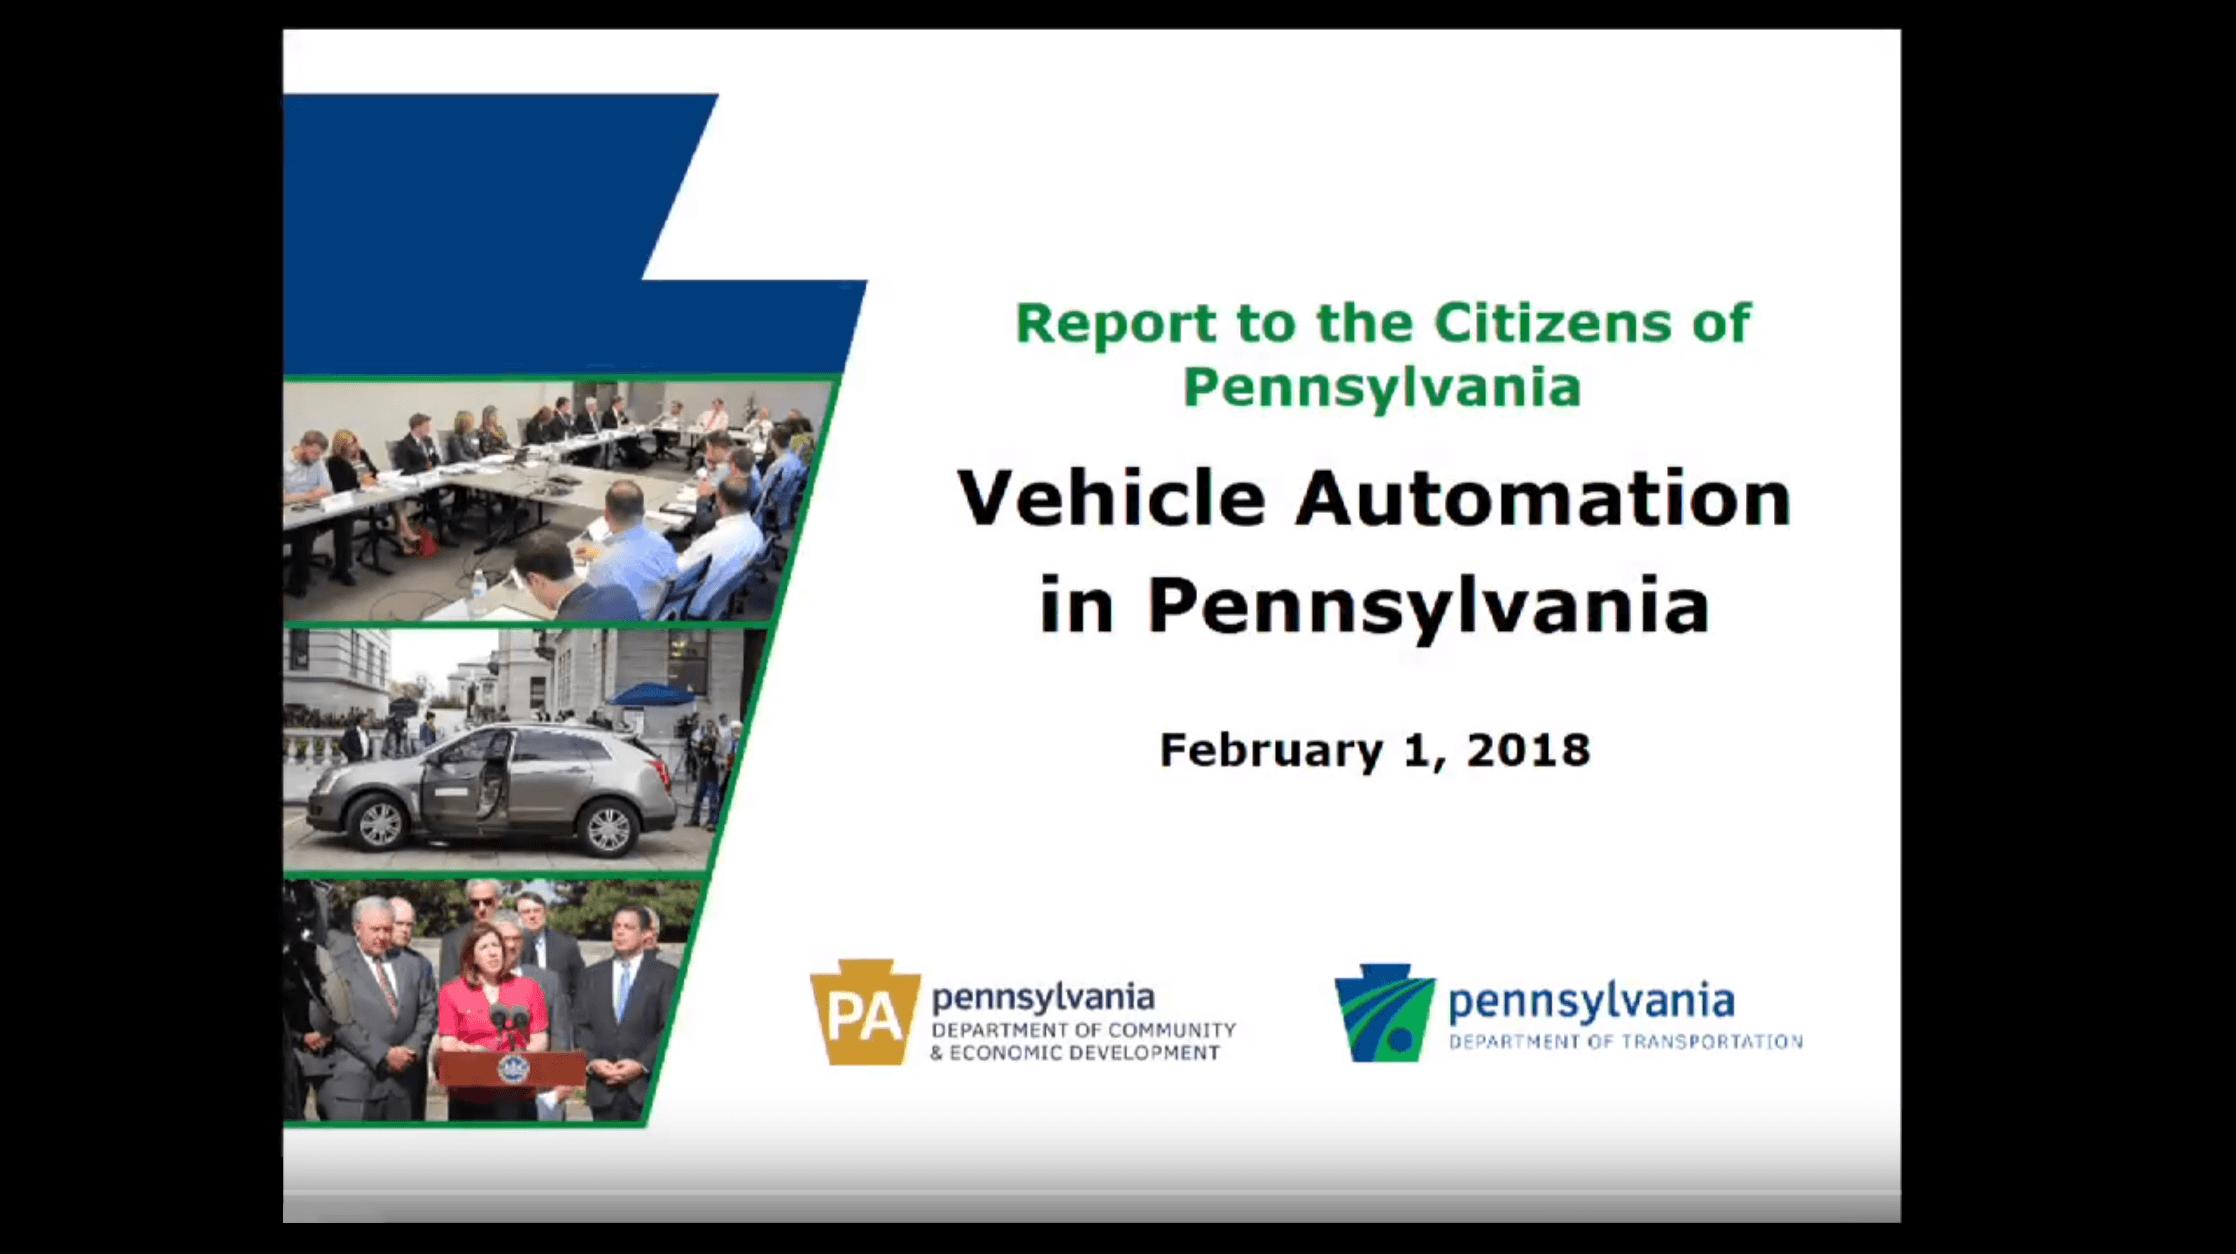 Vehicle Automation in Pennsylvania